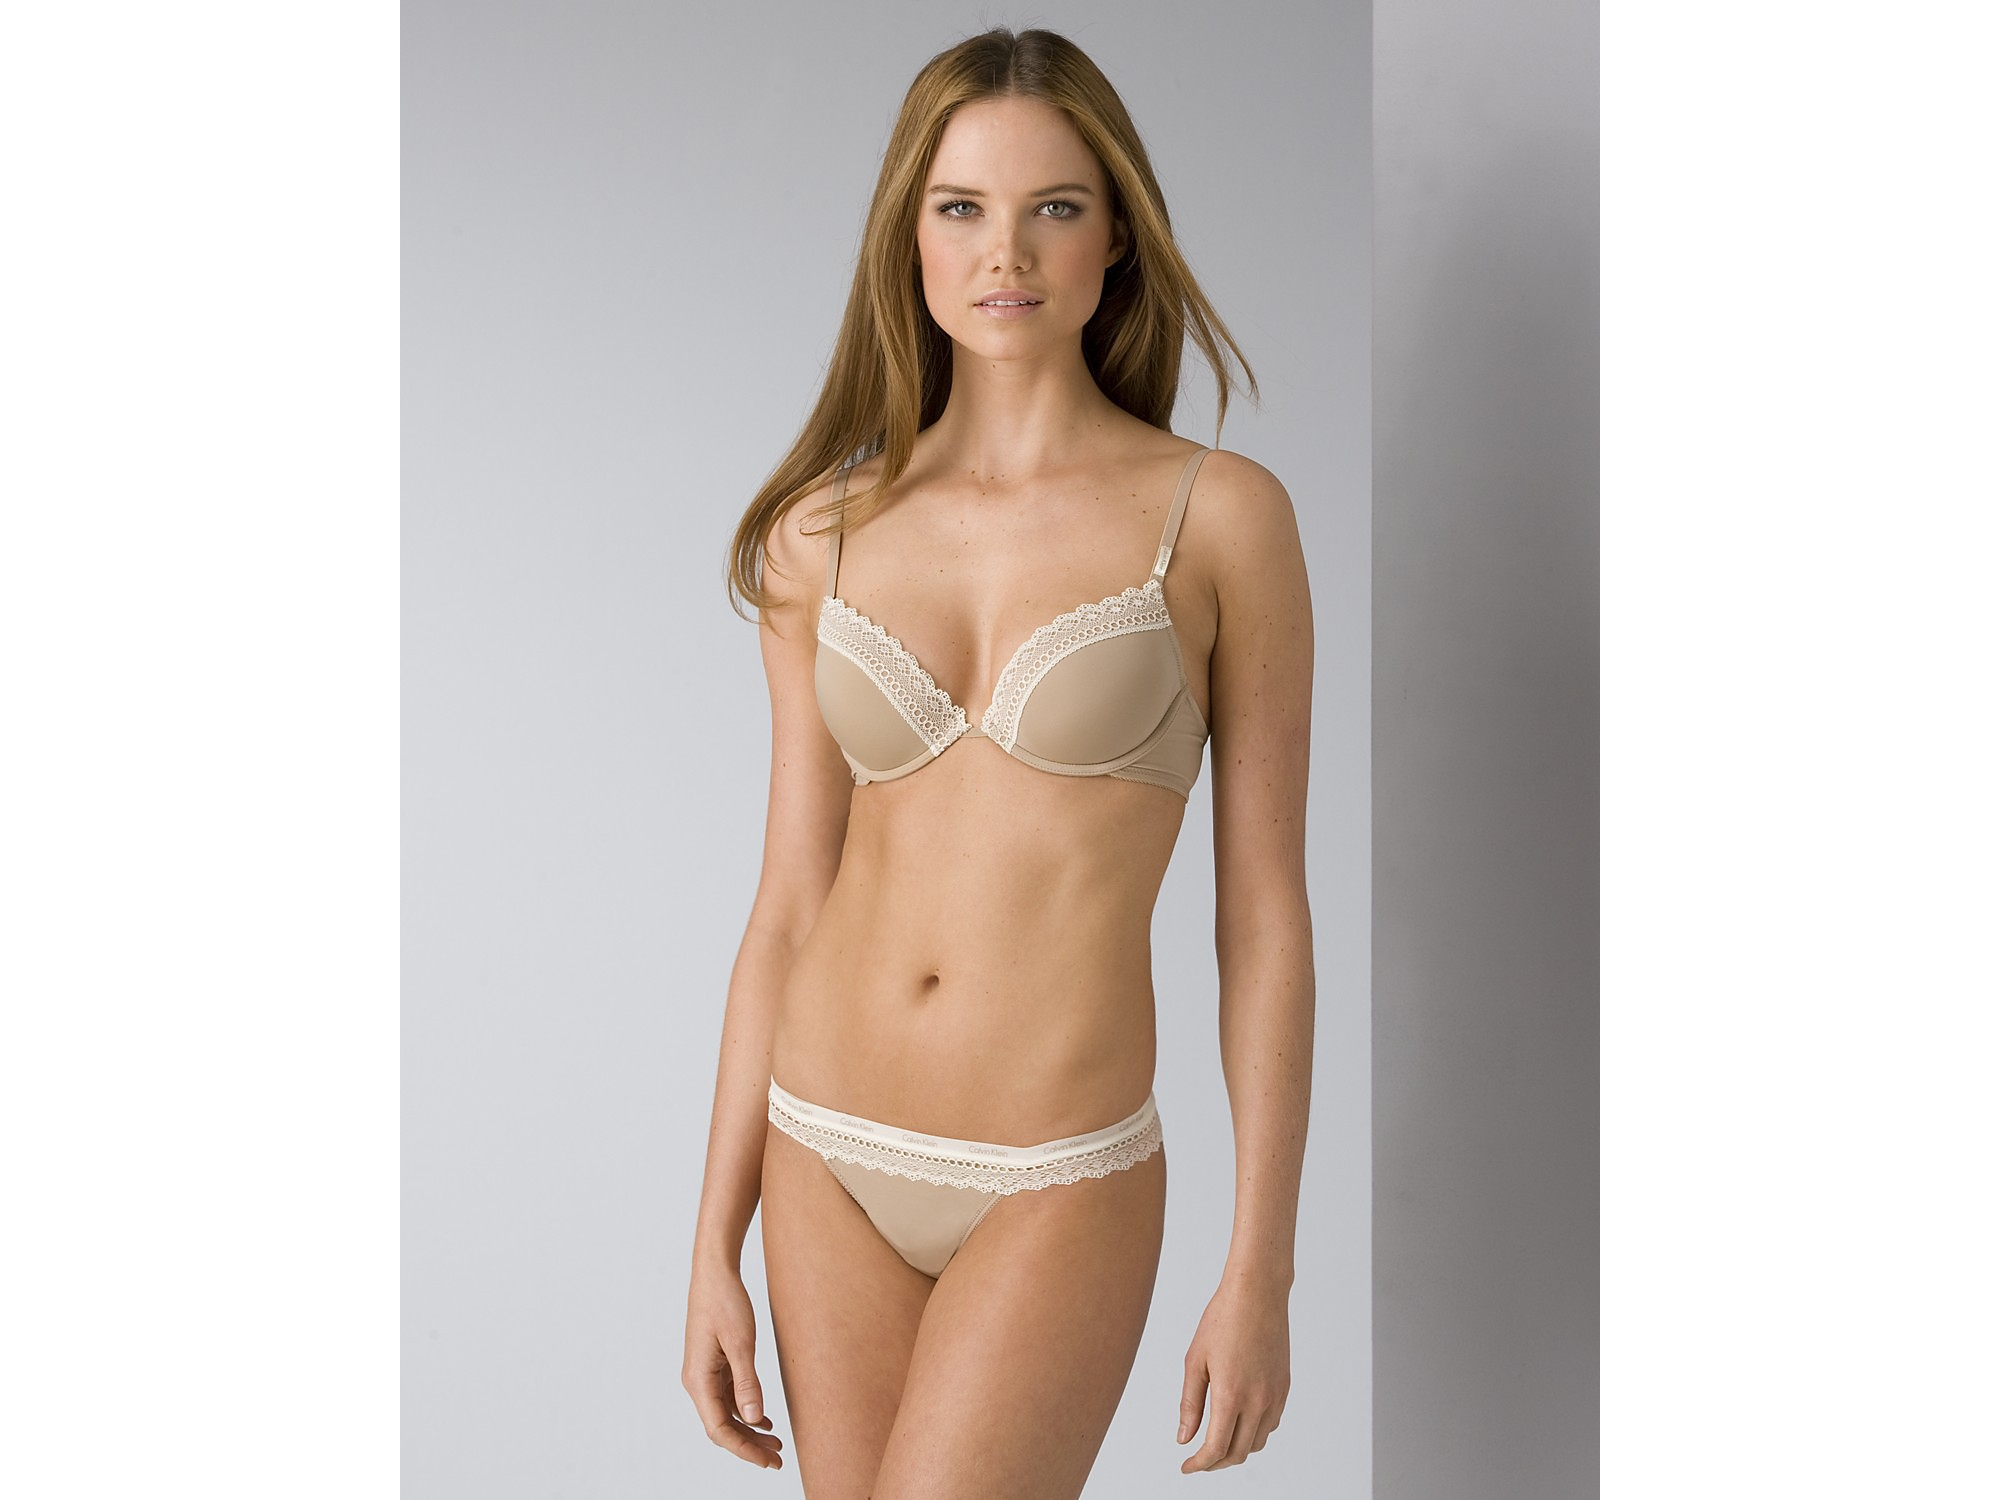 59c7088b4c46d Lyst - Calvin Klein Underwear Womens Perfectly Fit Flirty Push-up ...